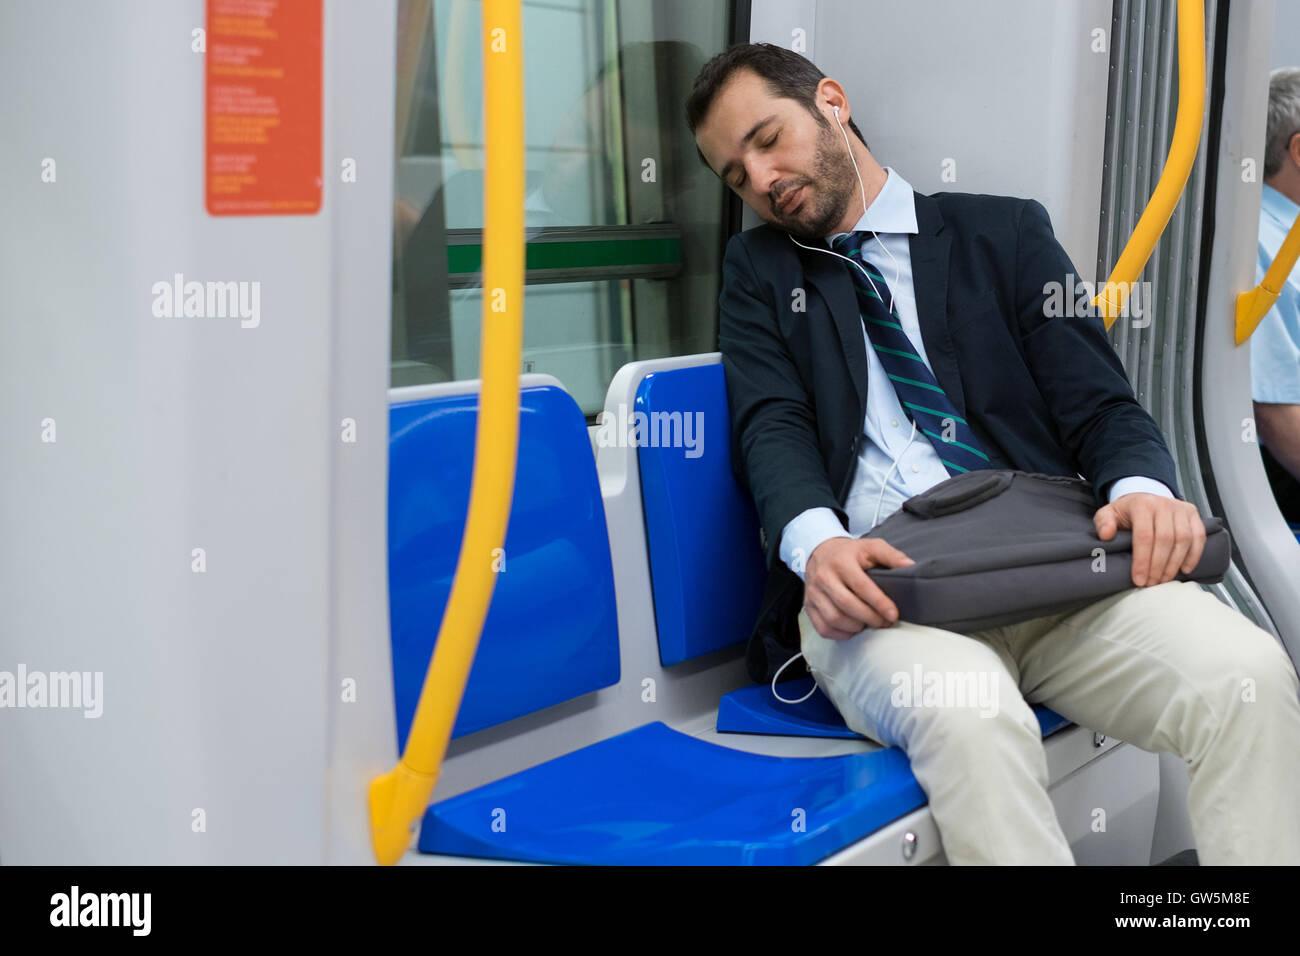 Tired businessman dormir sur le métro Photo Stock